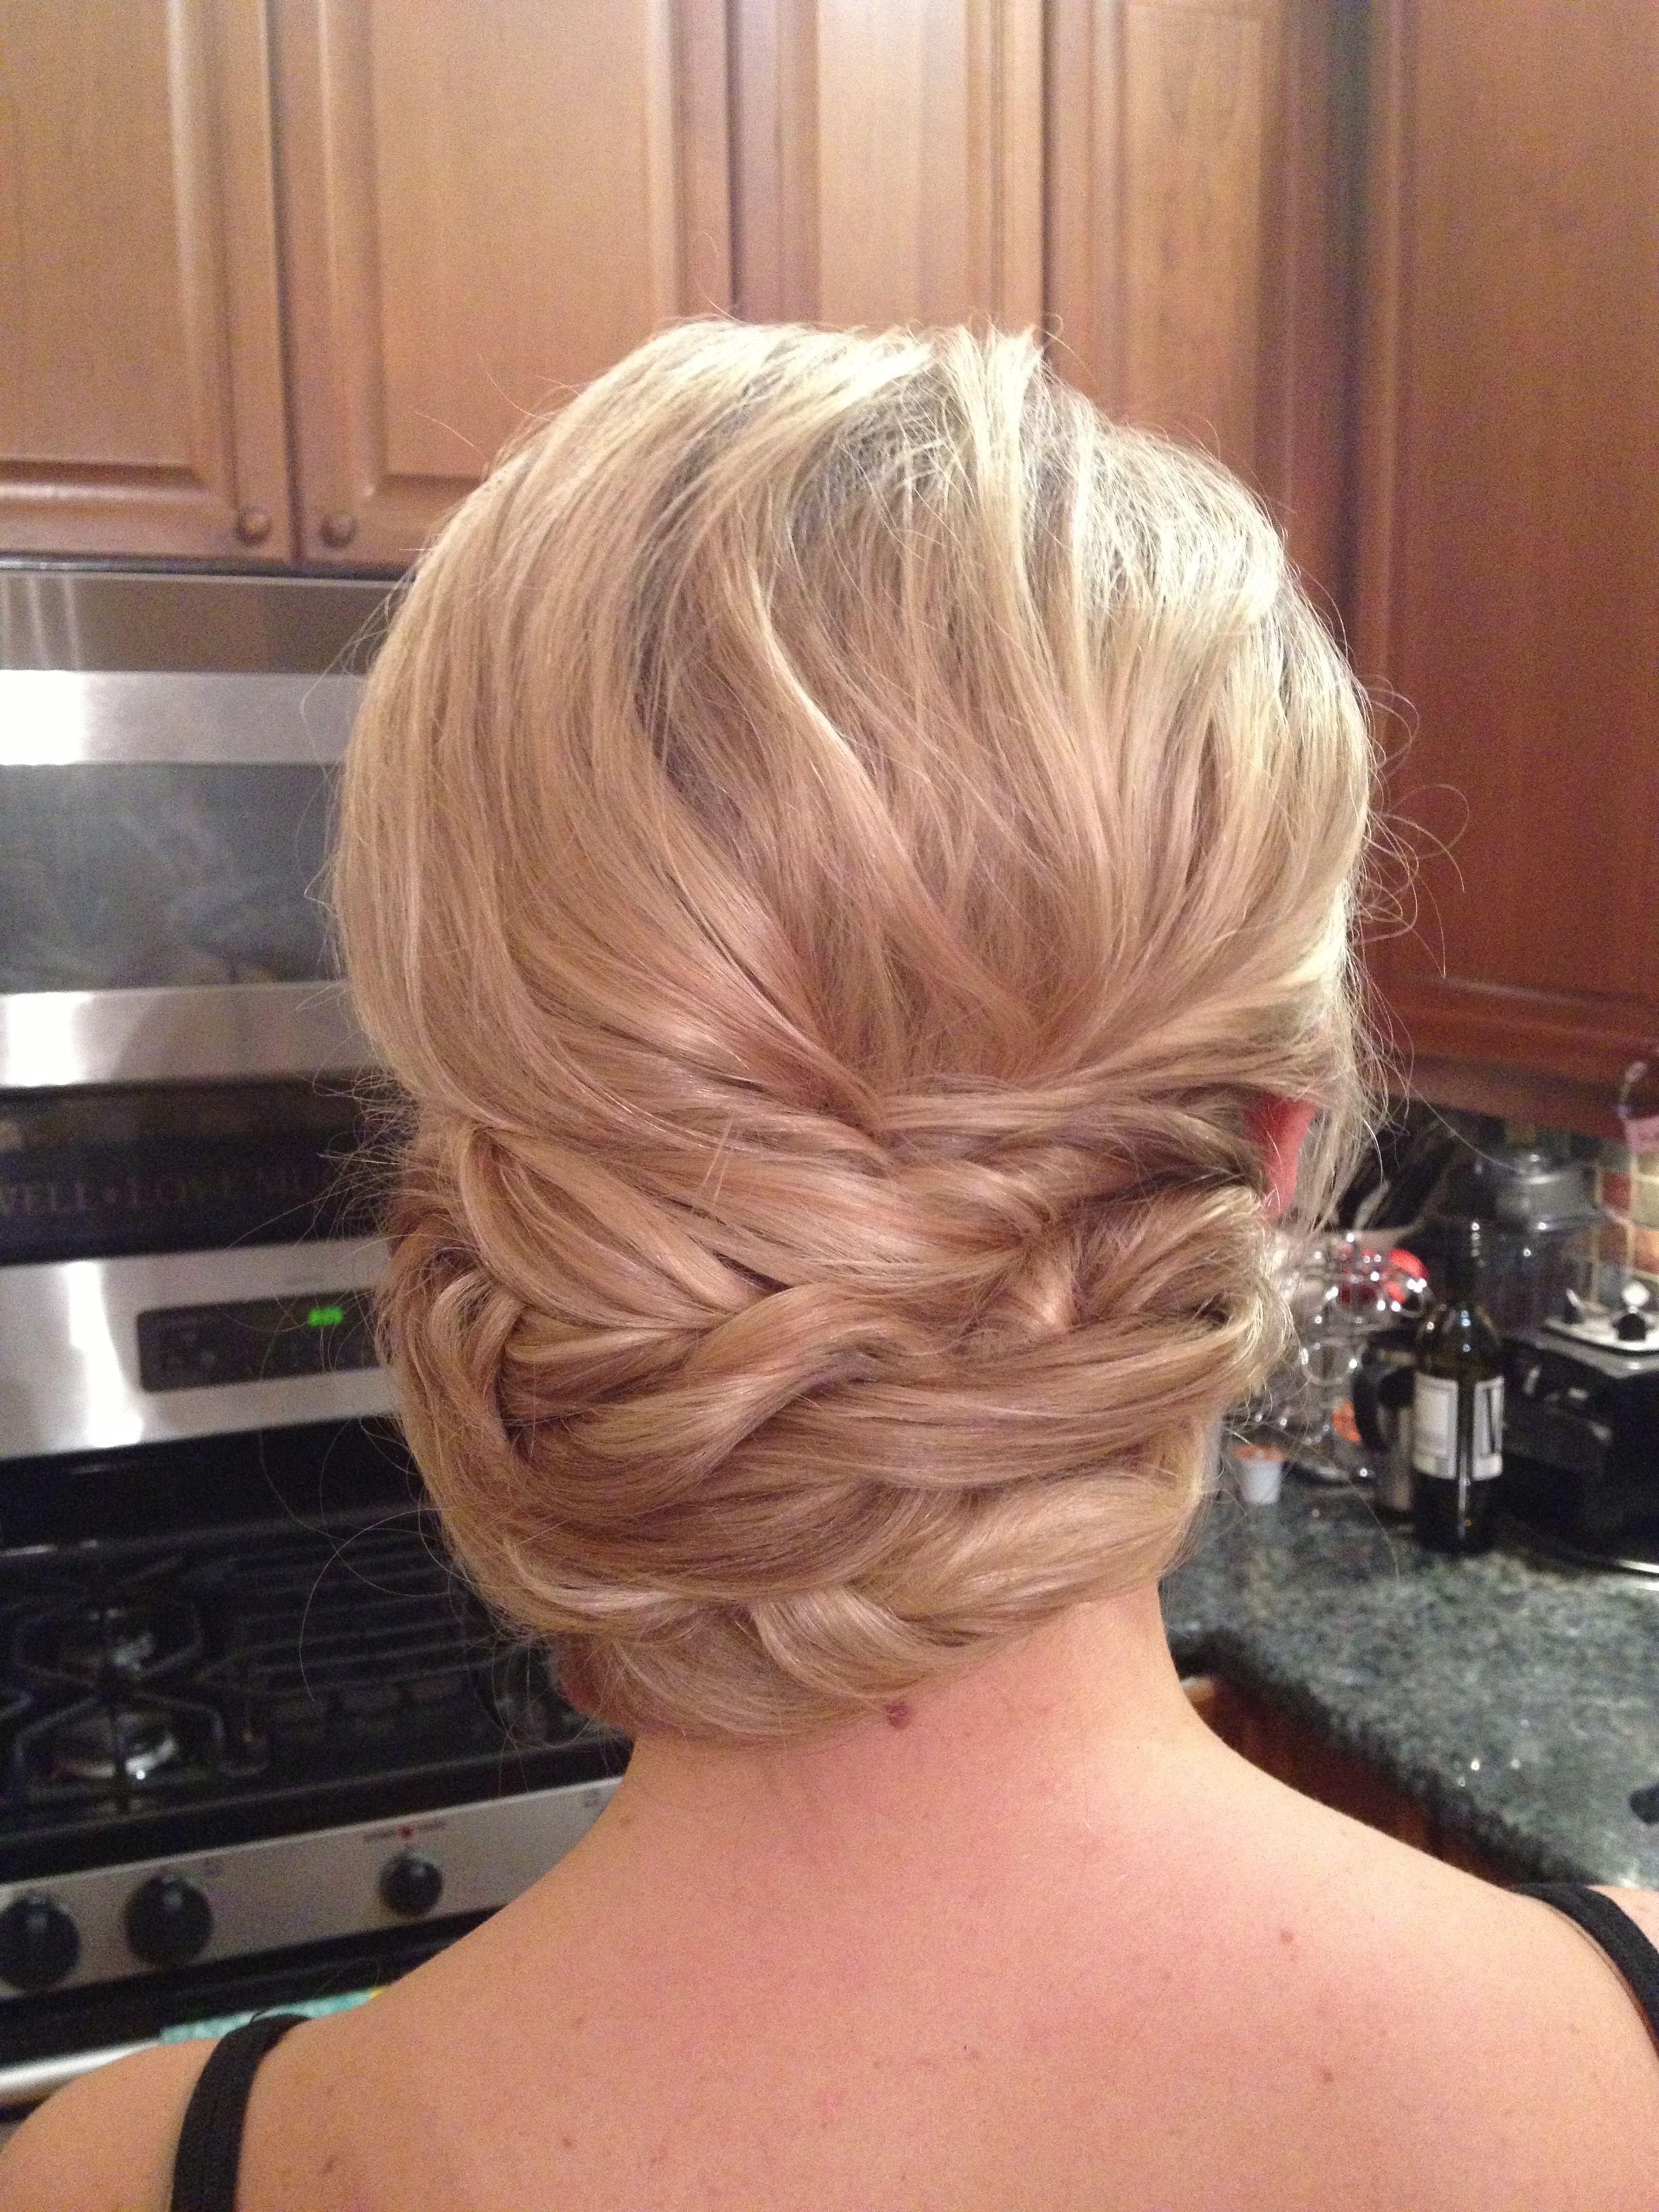 Barbies hairstyle womens hairstyles long easy pinterest hair